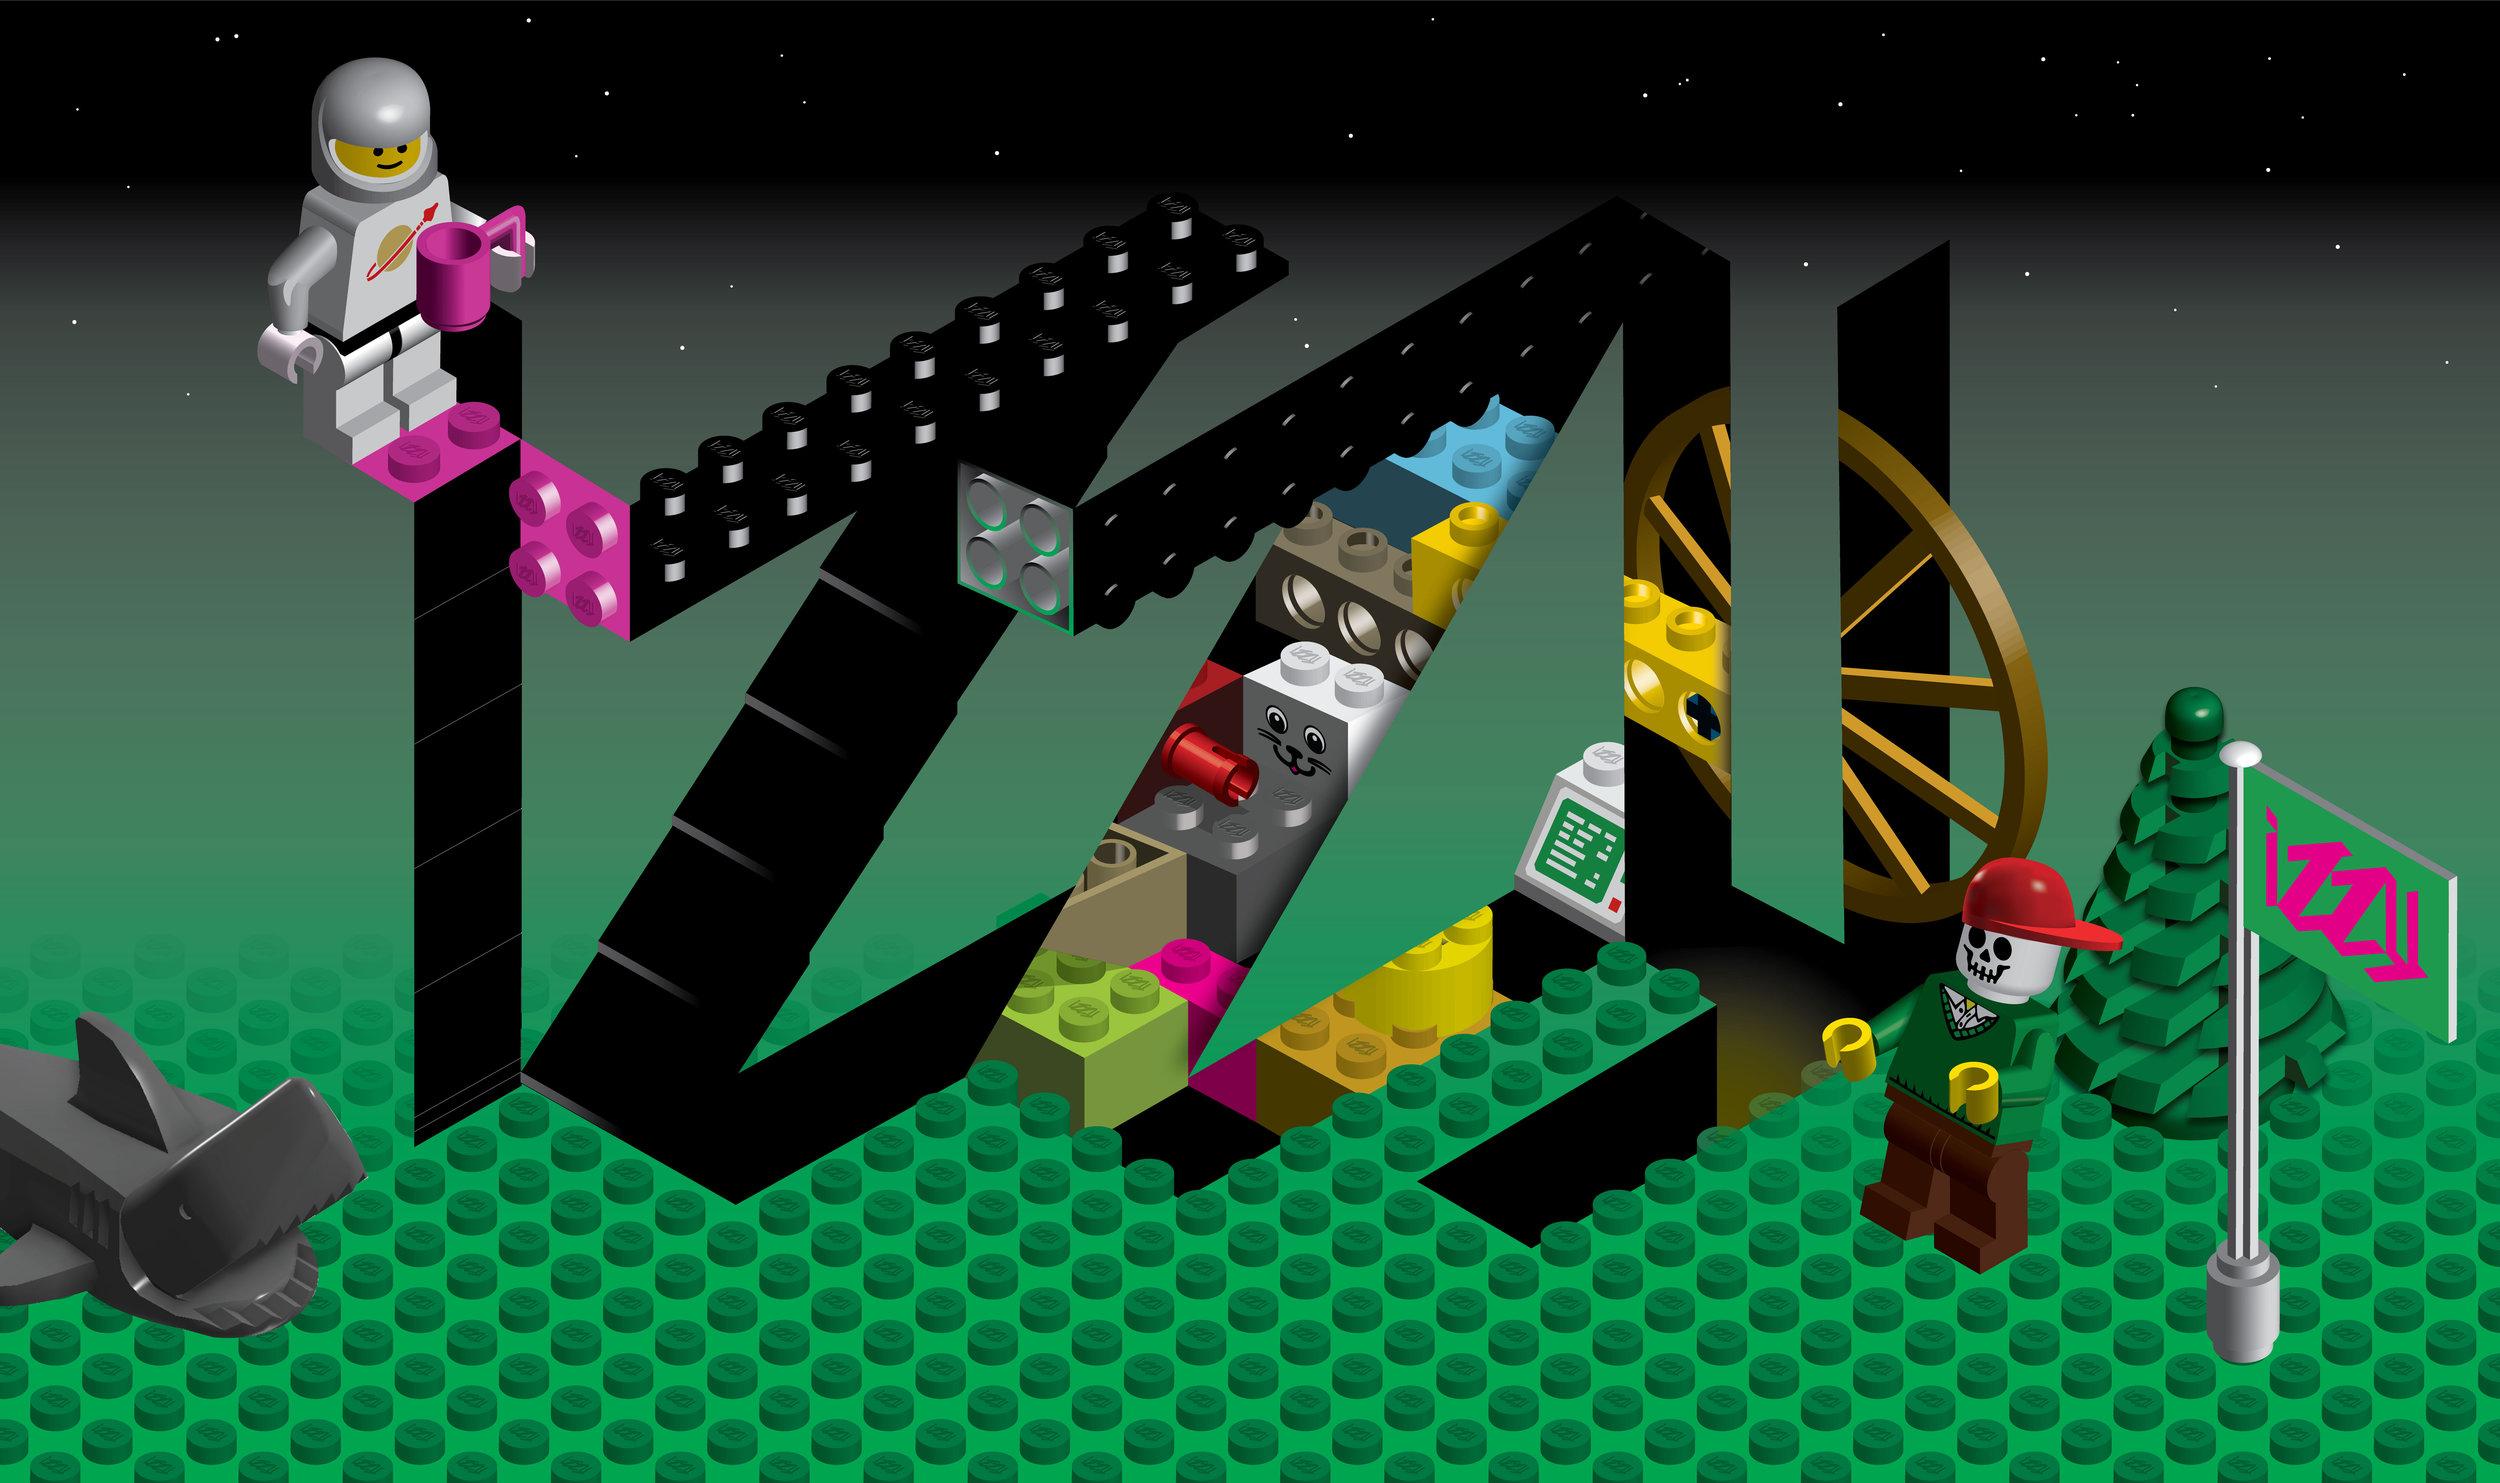 IZZY-Lego-Banner_Closeup.jpg